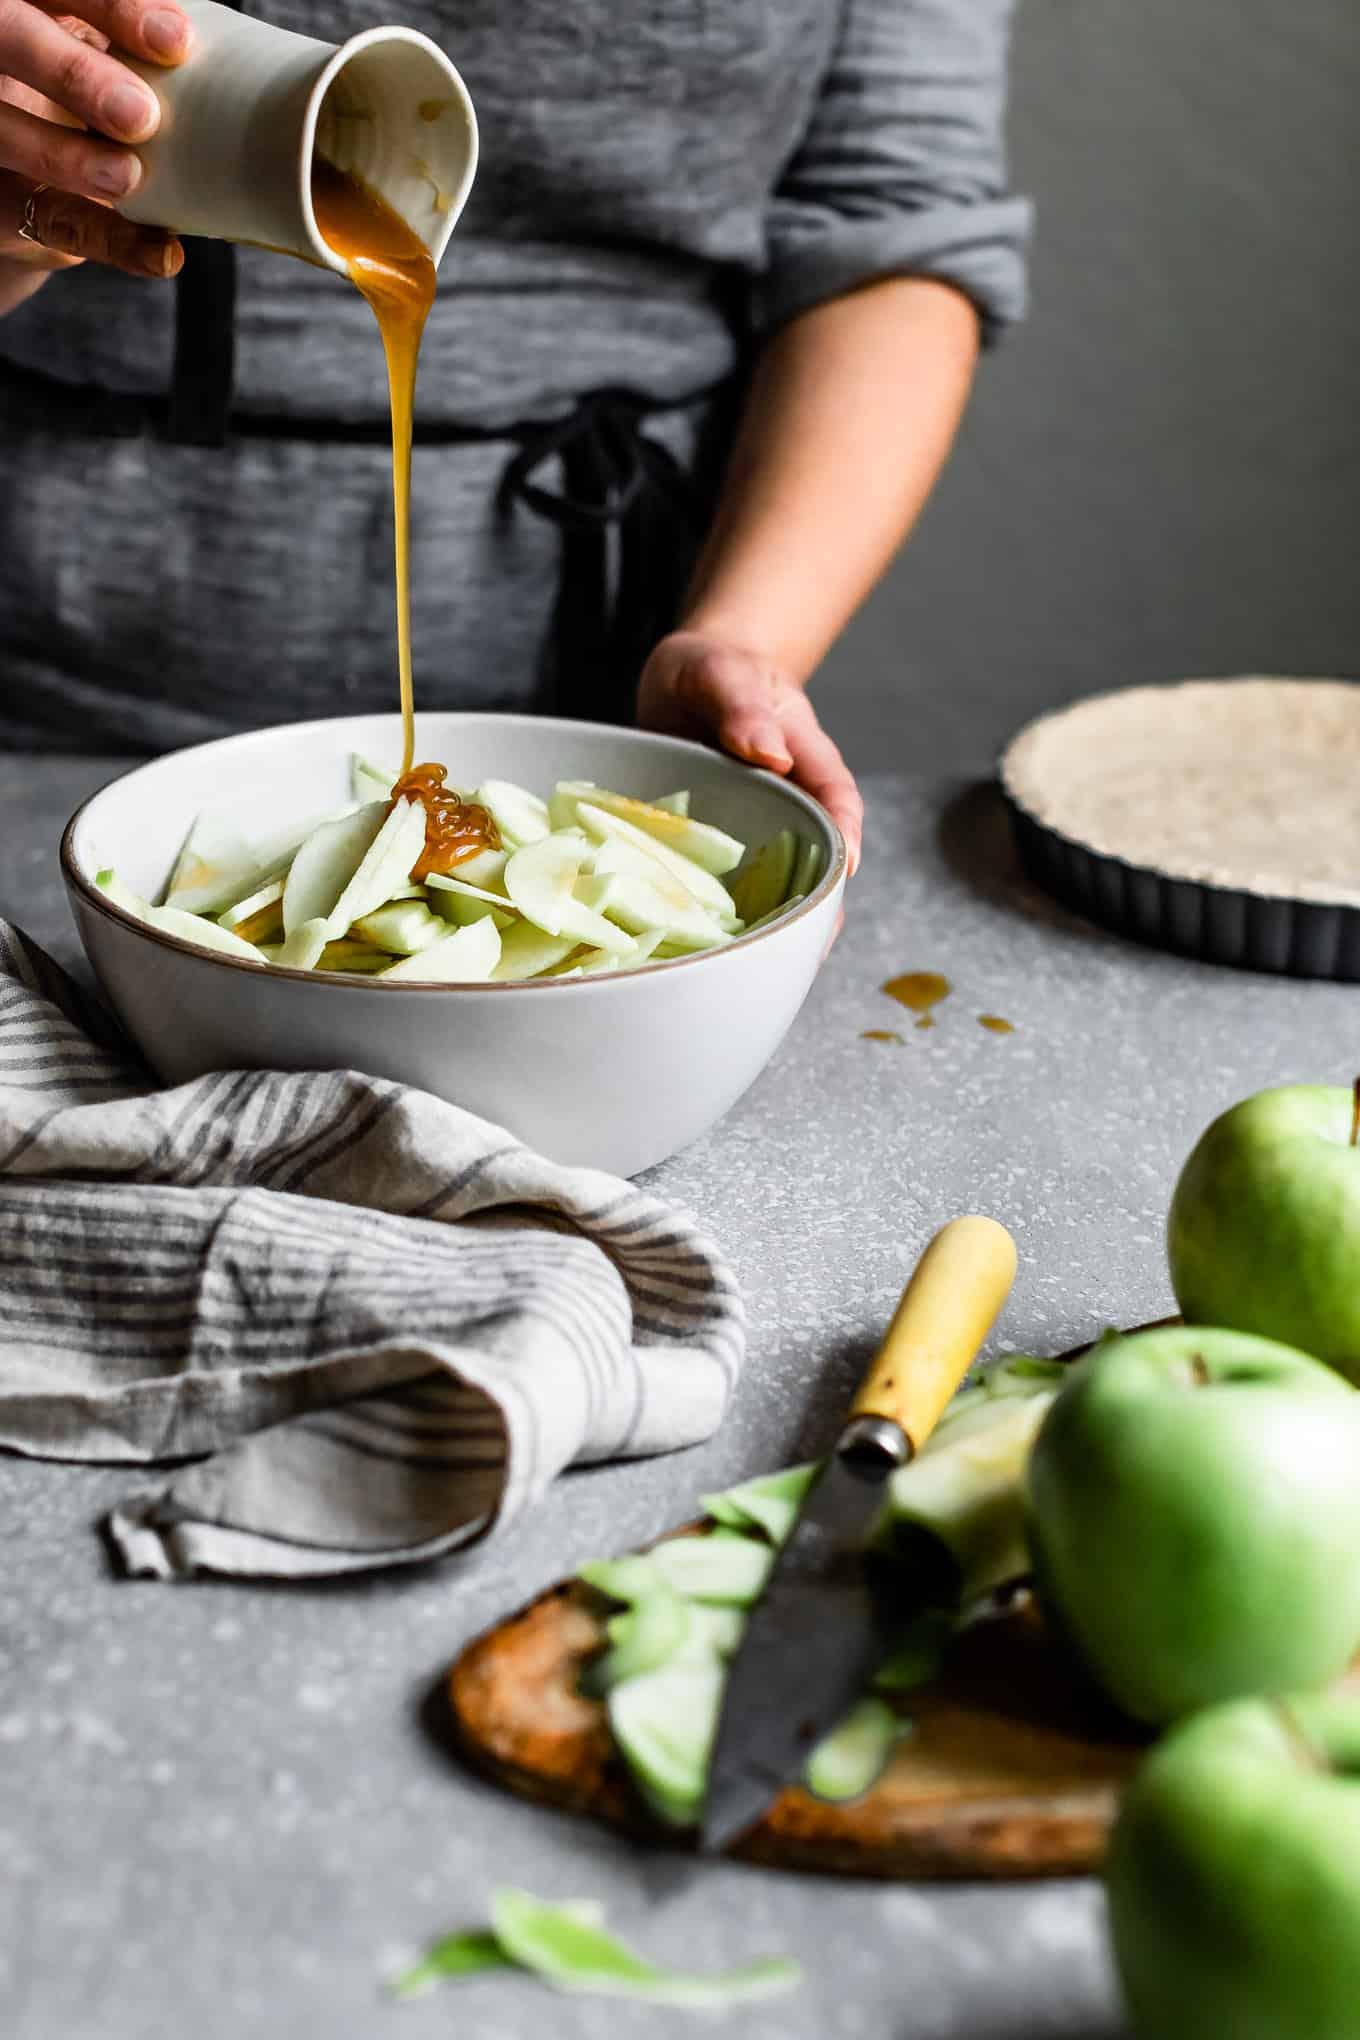 Vegan Gluten-Free Apple Pie with Caramel